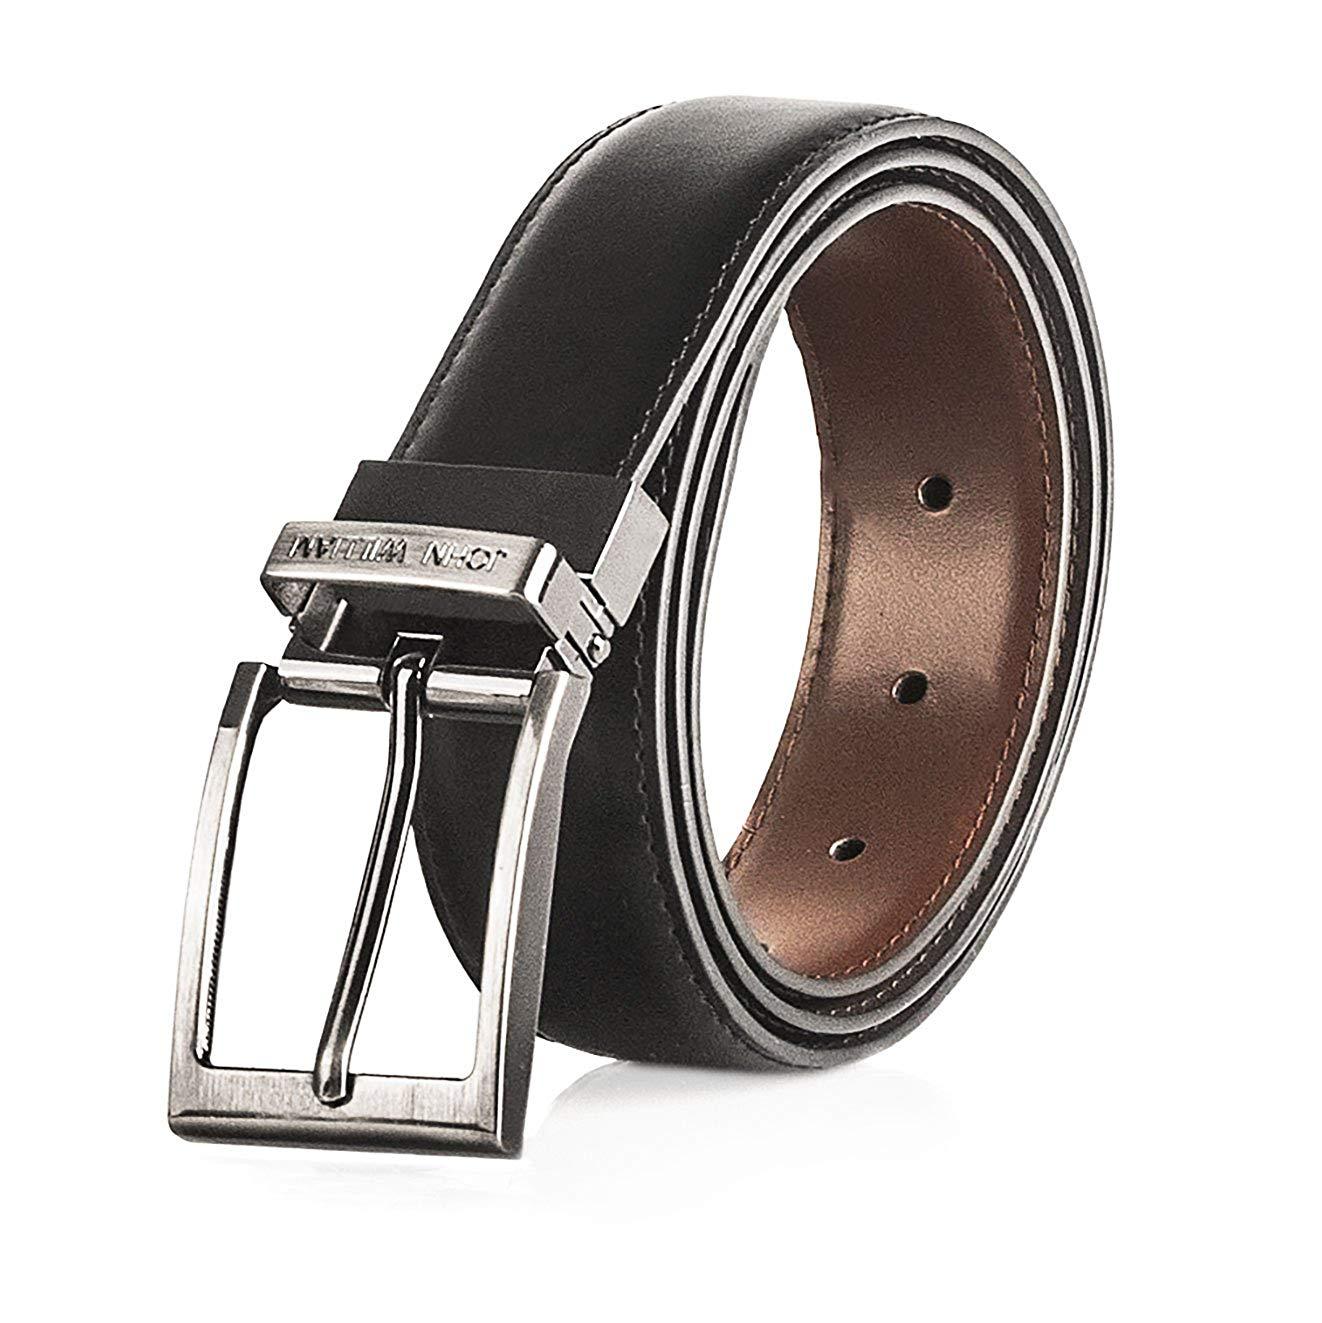 Pajamasea Men Belt Cowhide Genuine Leather Belts Automatic Buckle Belts Brown Black Belts